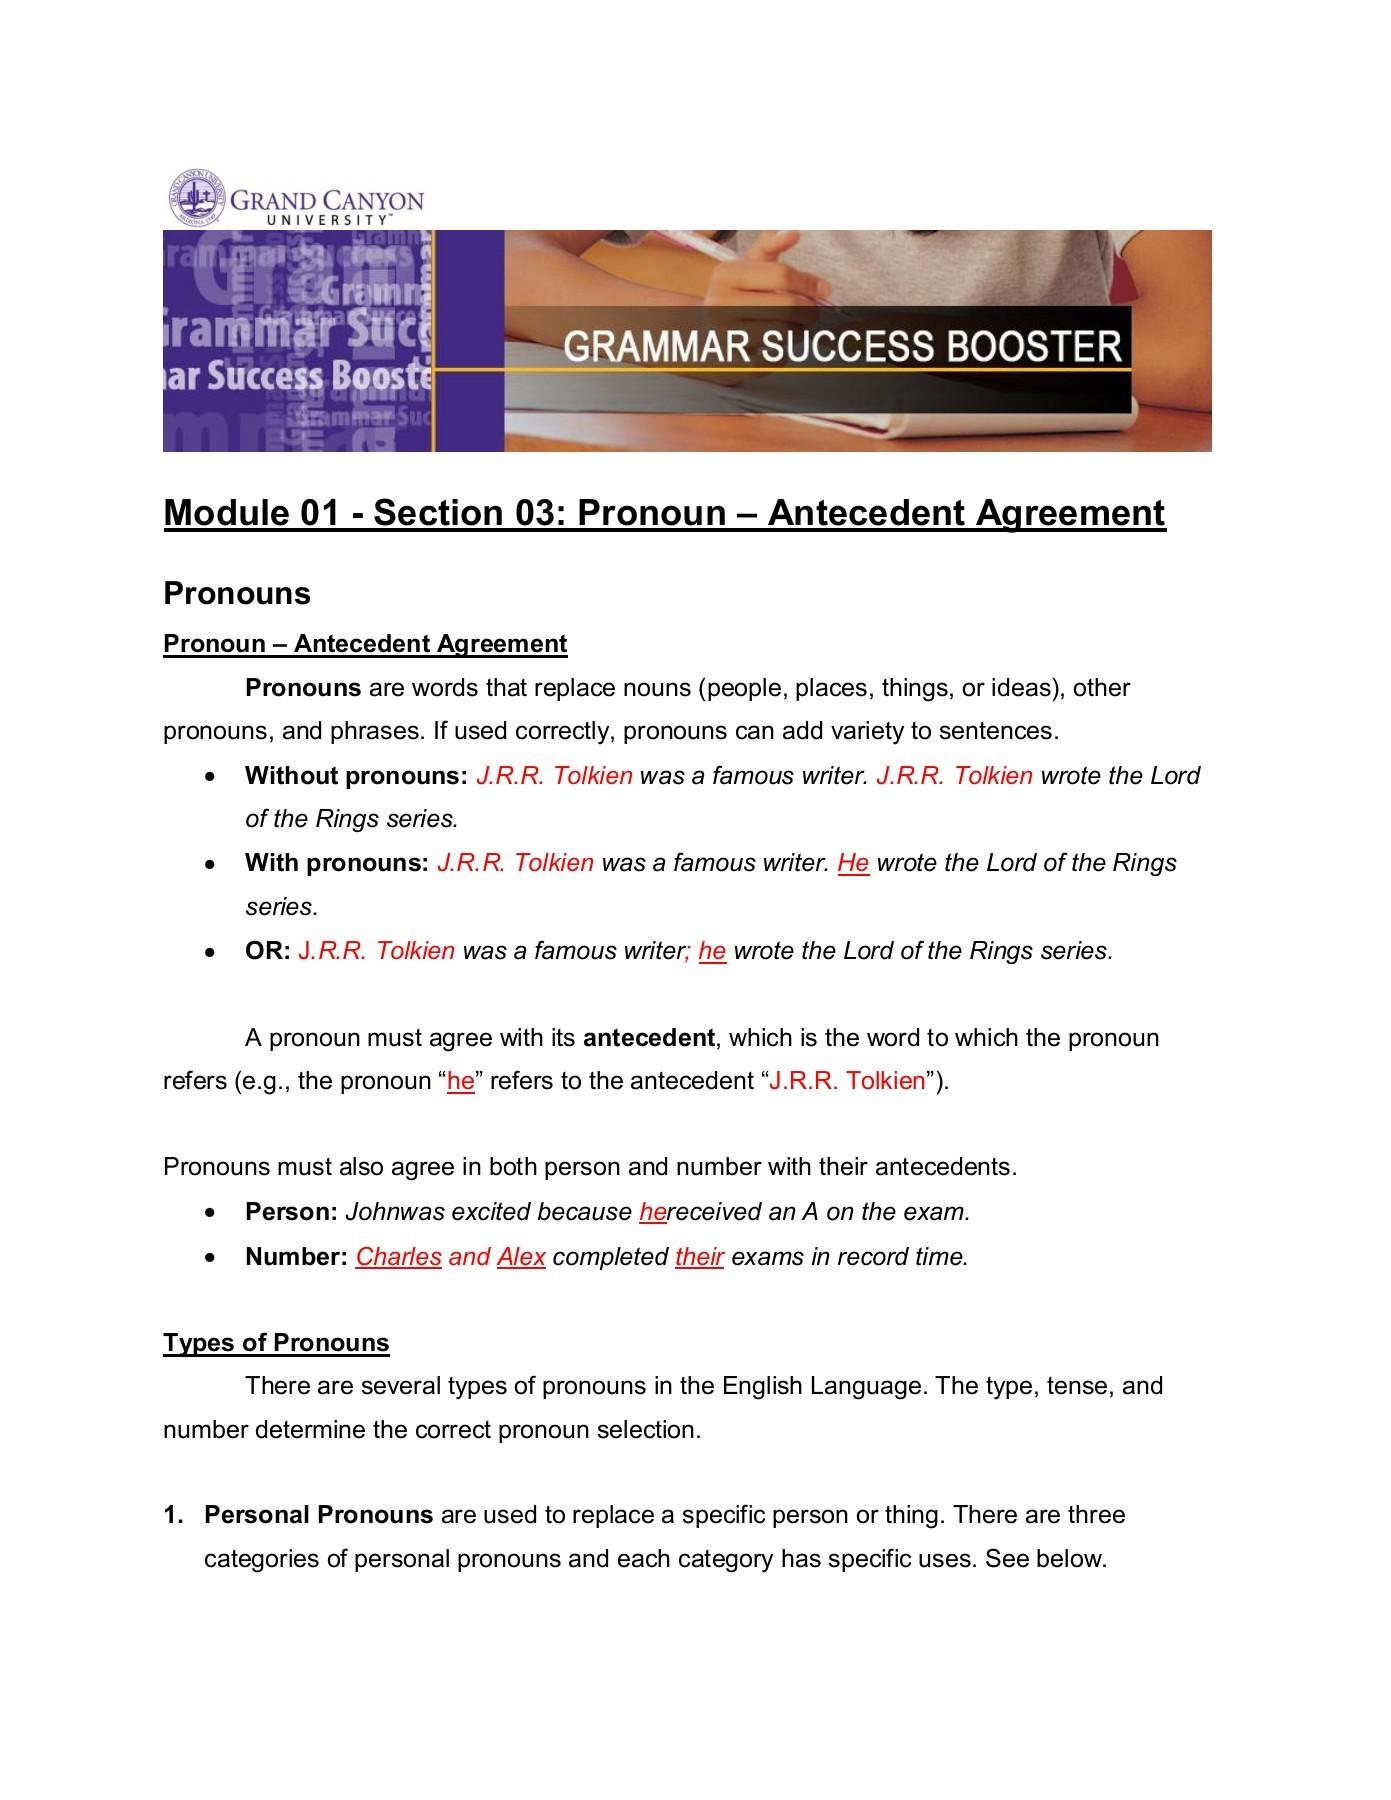 hight resolution of pronoun antecedent agreement for 2021